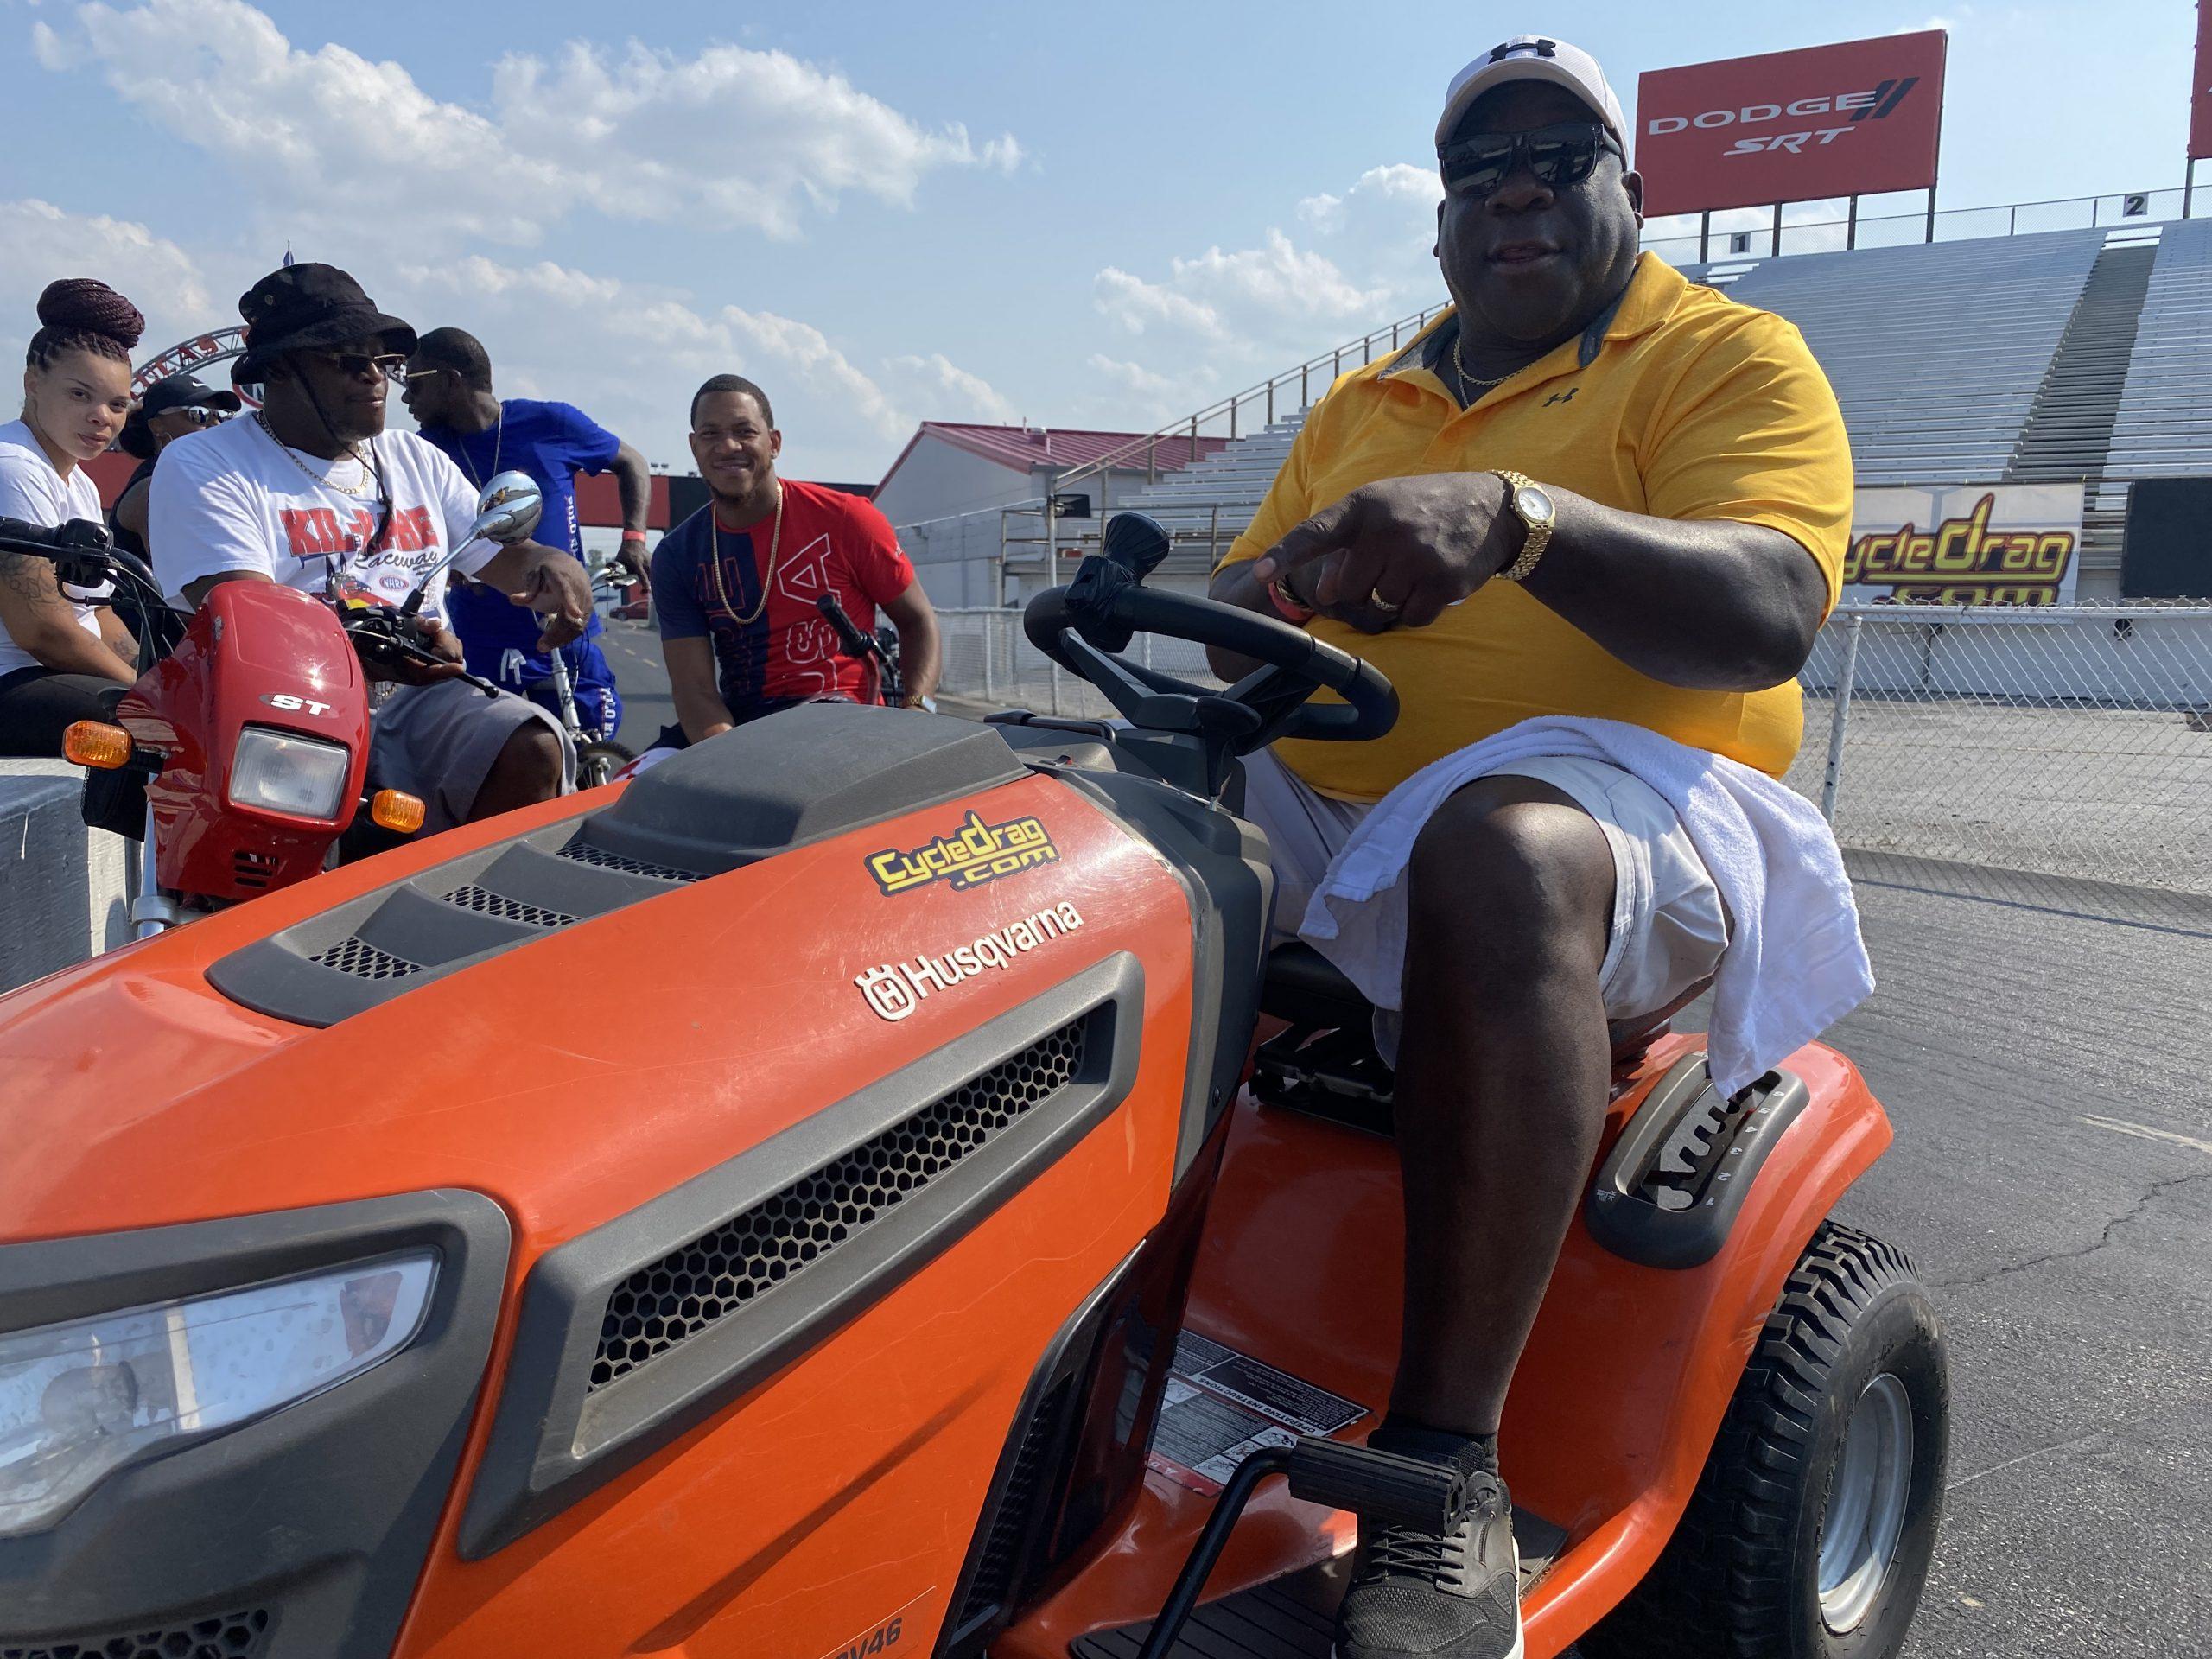 Drag Racing Tractor